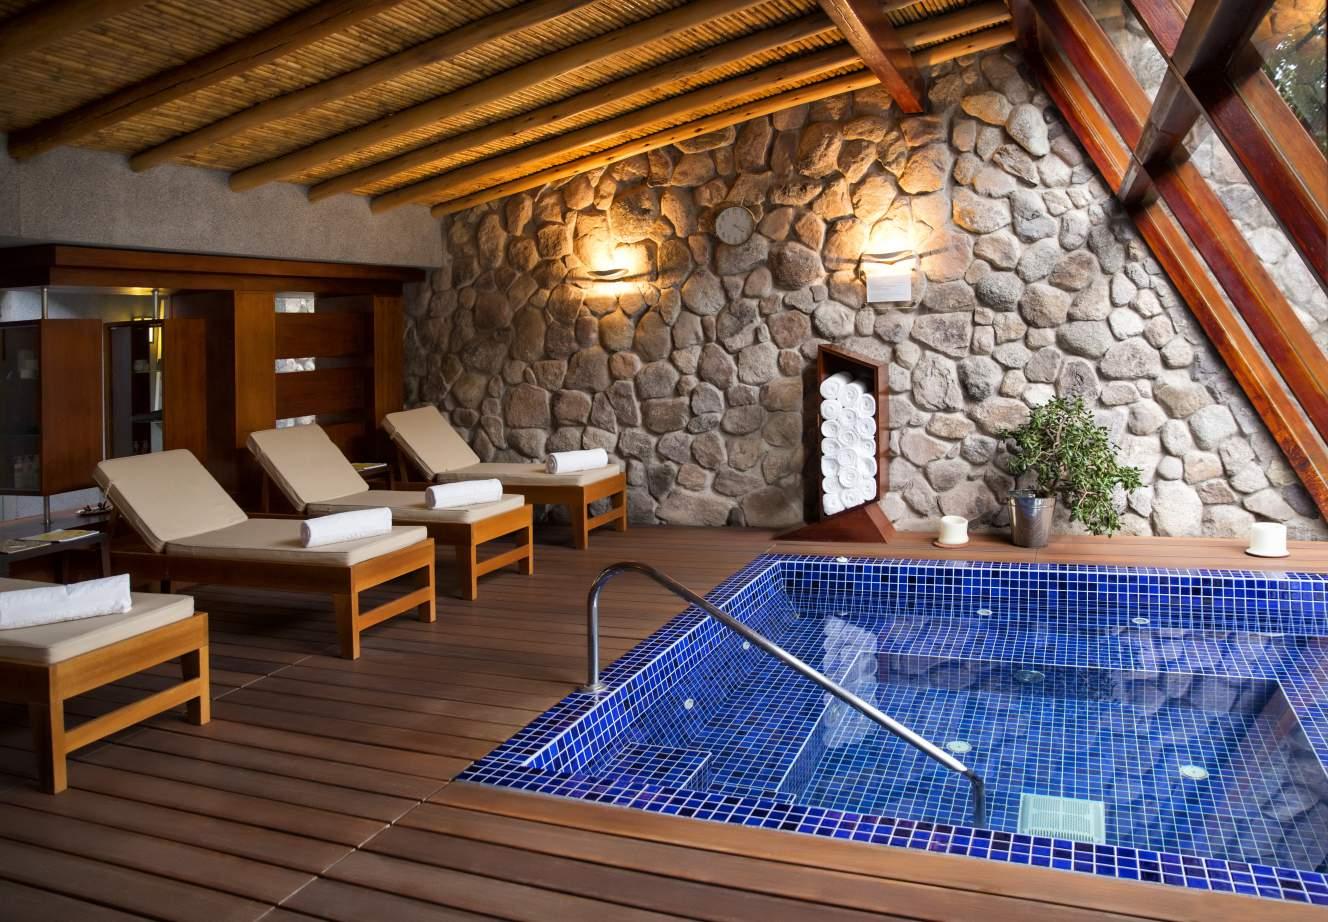 Things to do in Sacred Valley - Belmond Rio Sagrado pool.